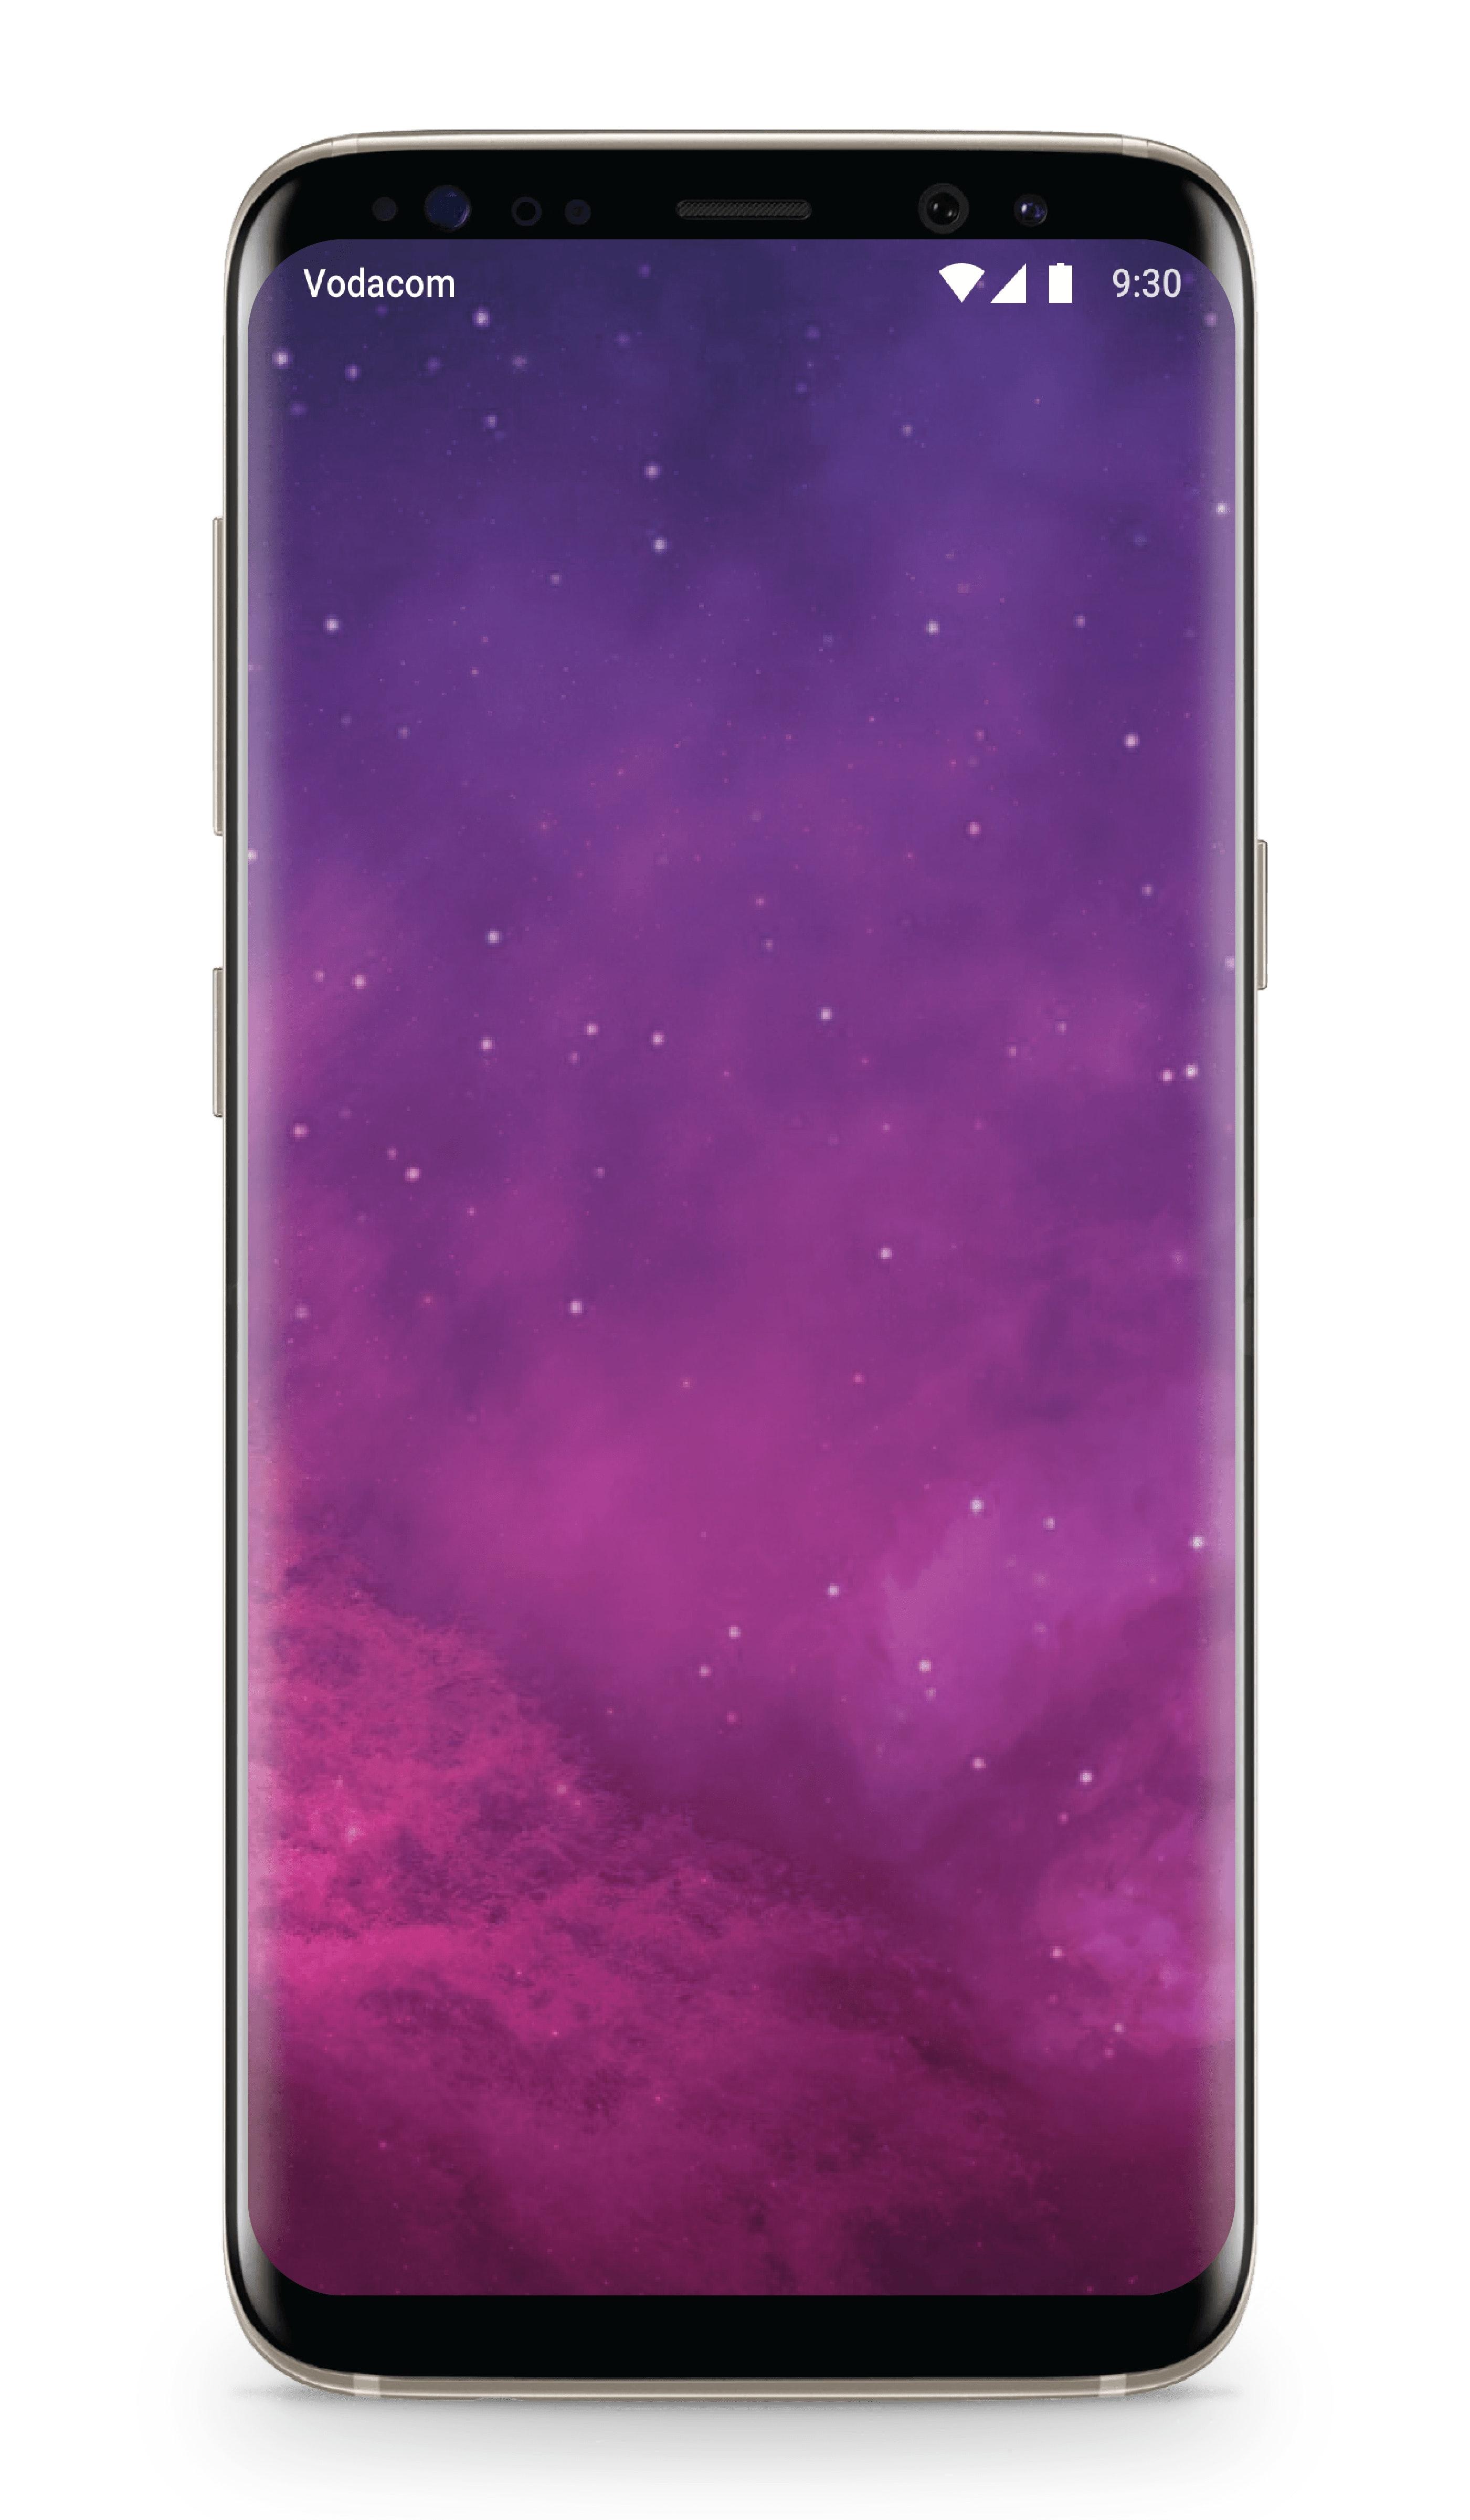 Samsung Galaxy S8+ image